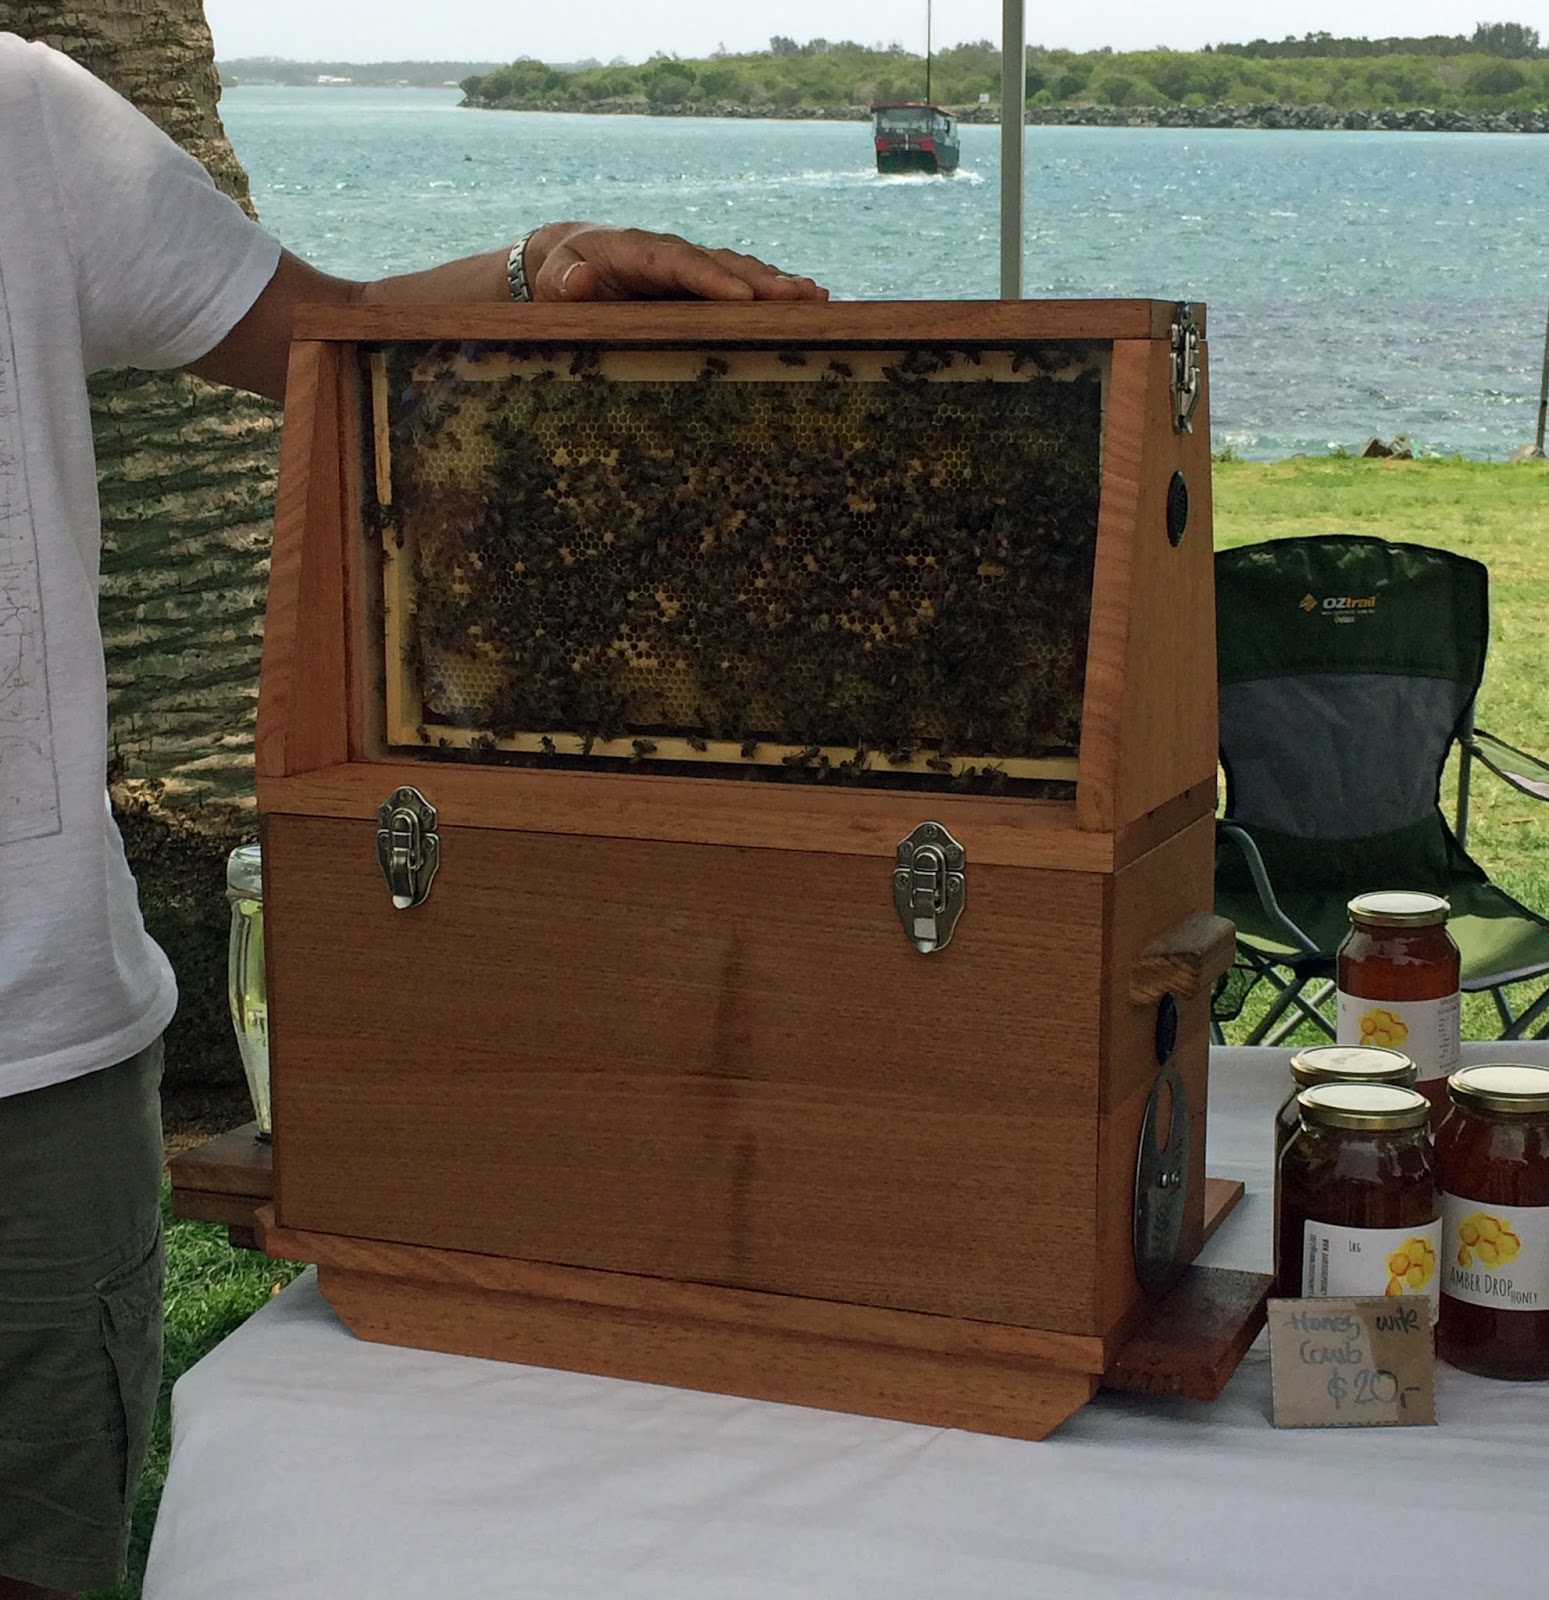 Honey Bees at Port Macquarie Tastings on Hastings Festival Day